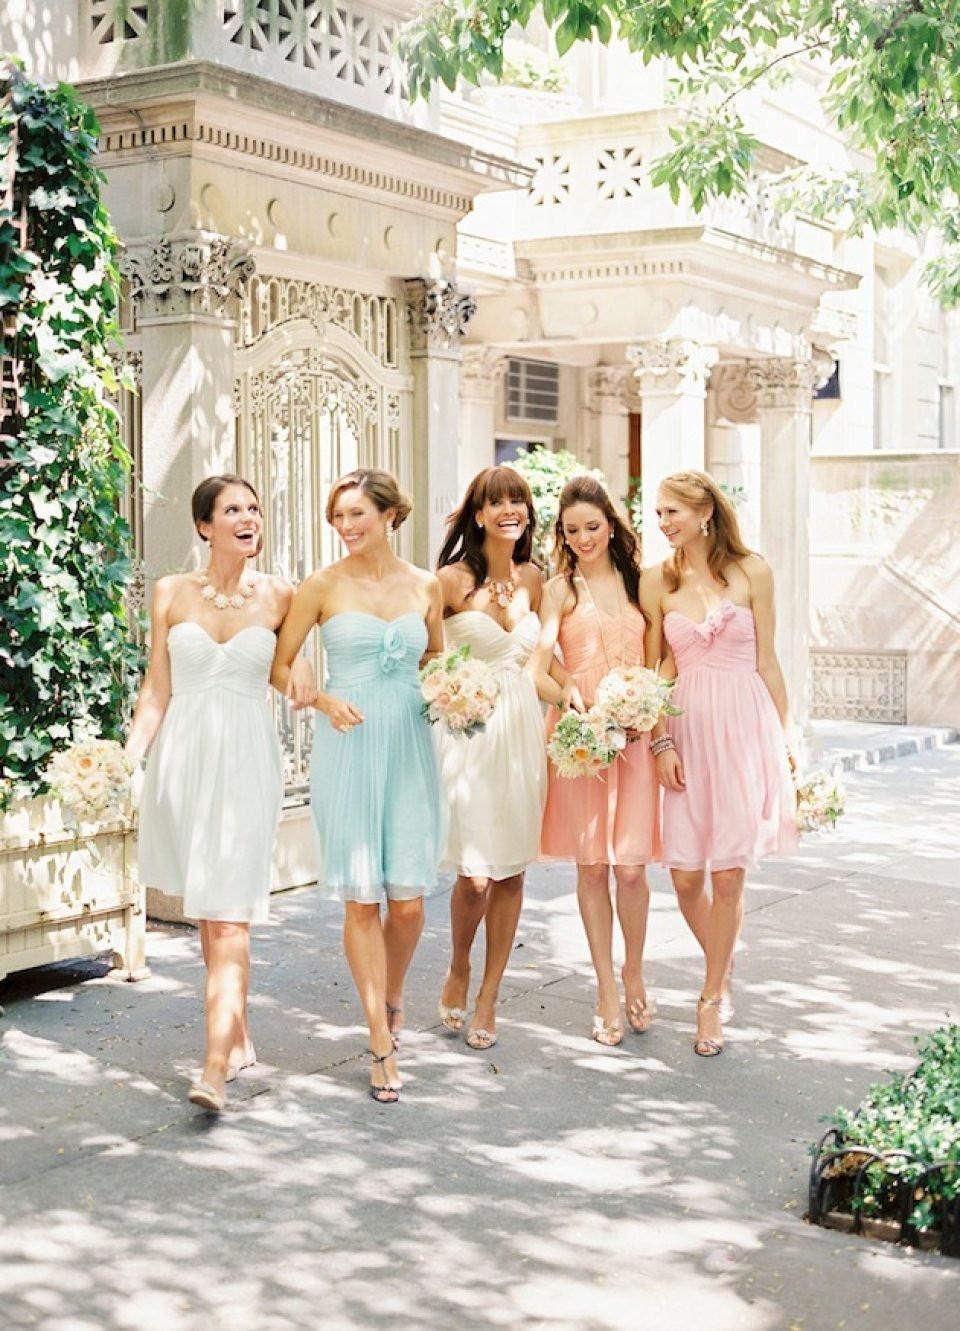 jurk kopen bruiloft